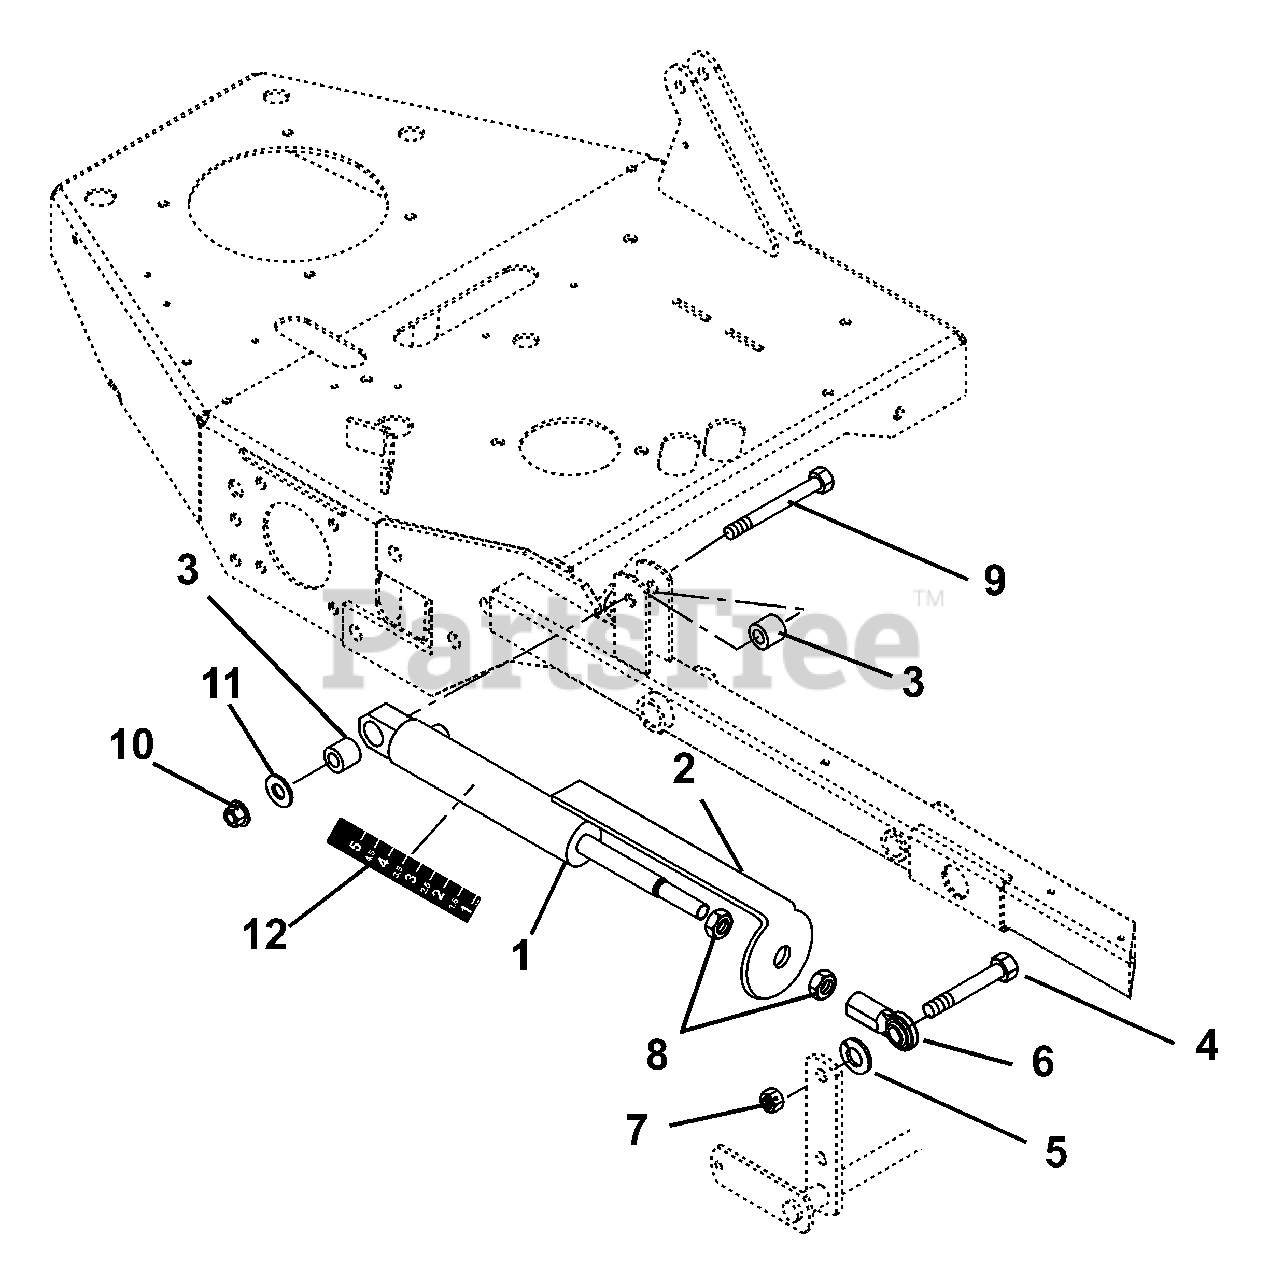 Gravely Pm 320